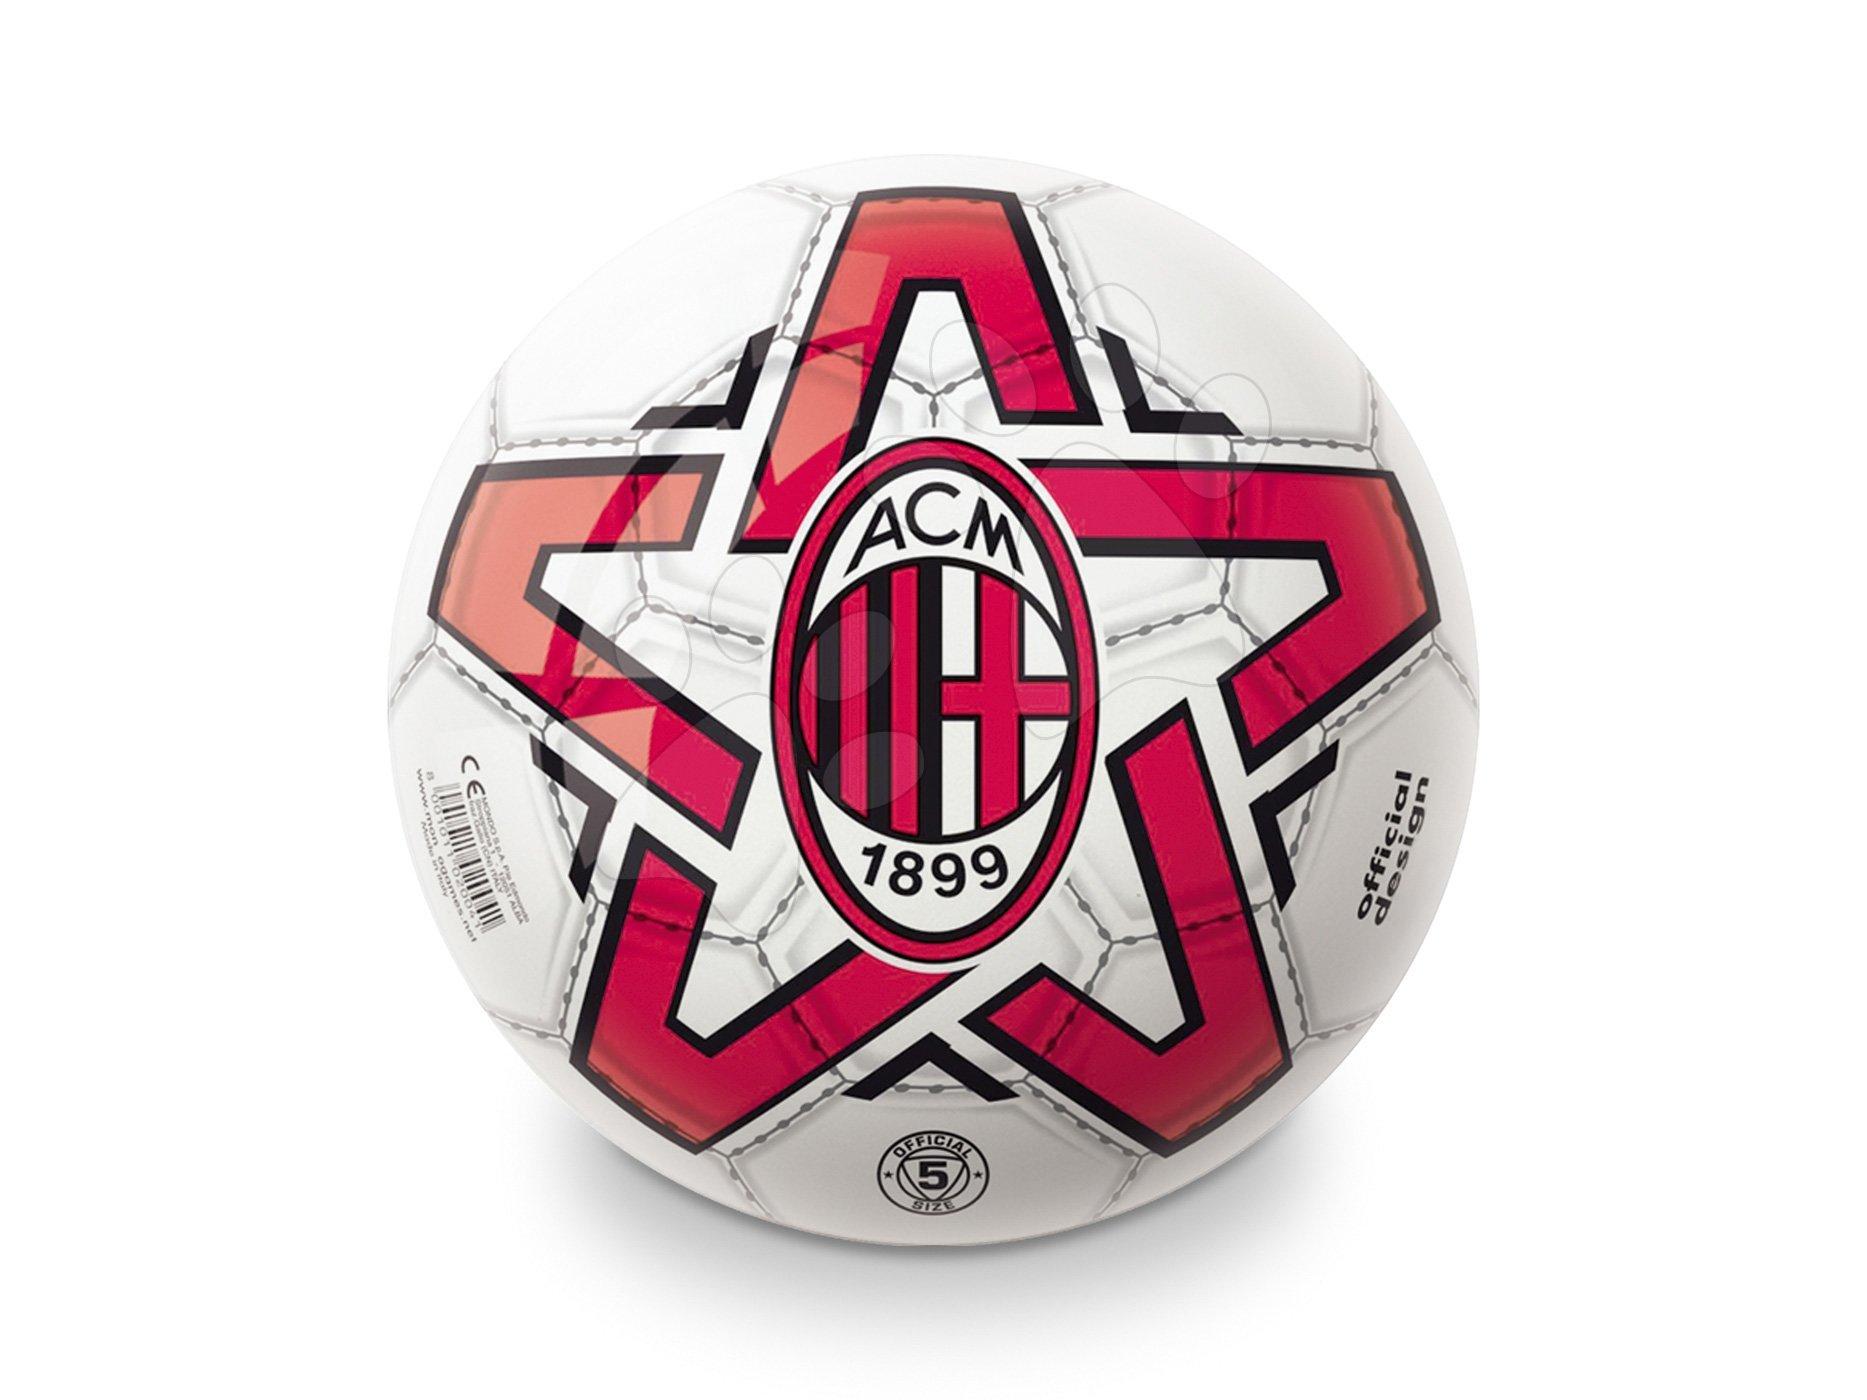 Gumi focilabda A.C.Milan Mondo méret 230 mm